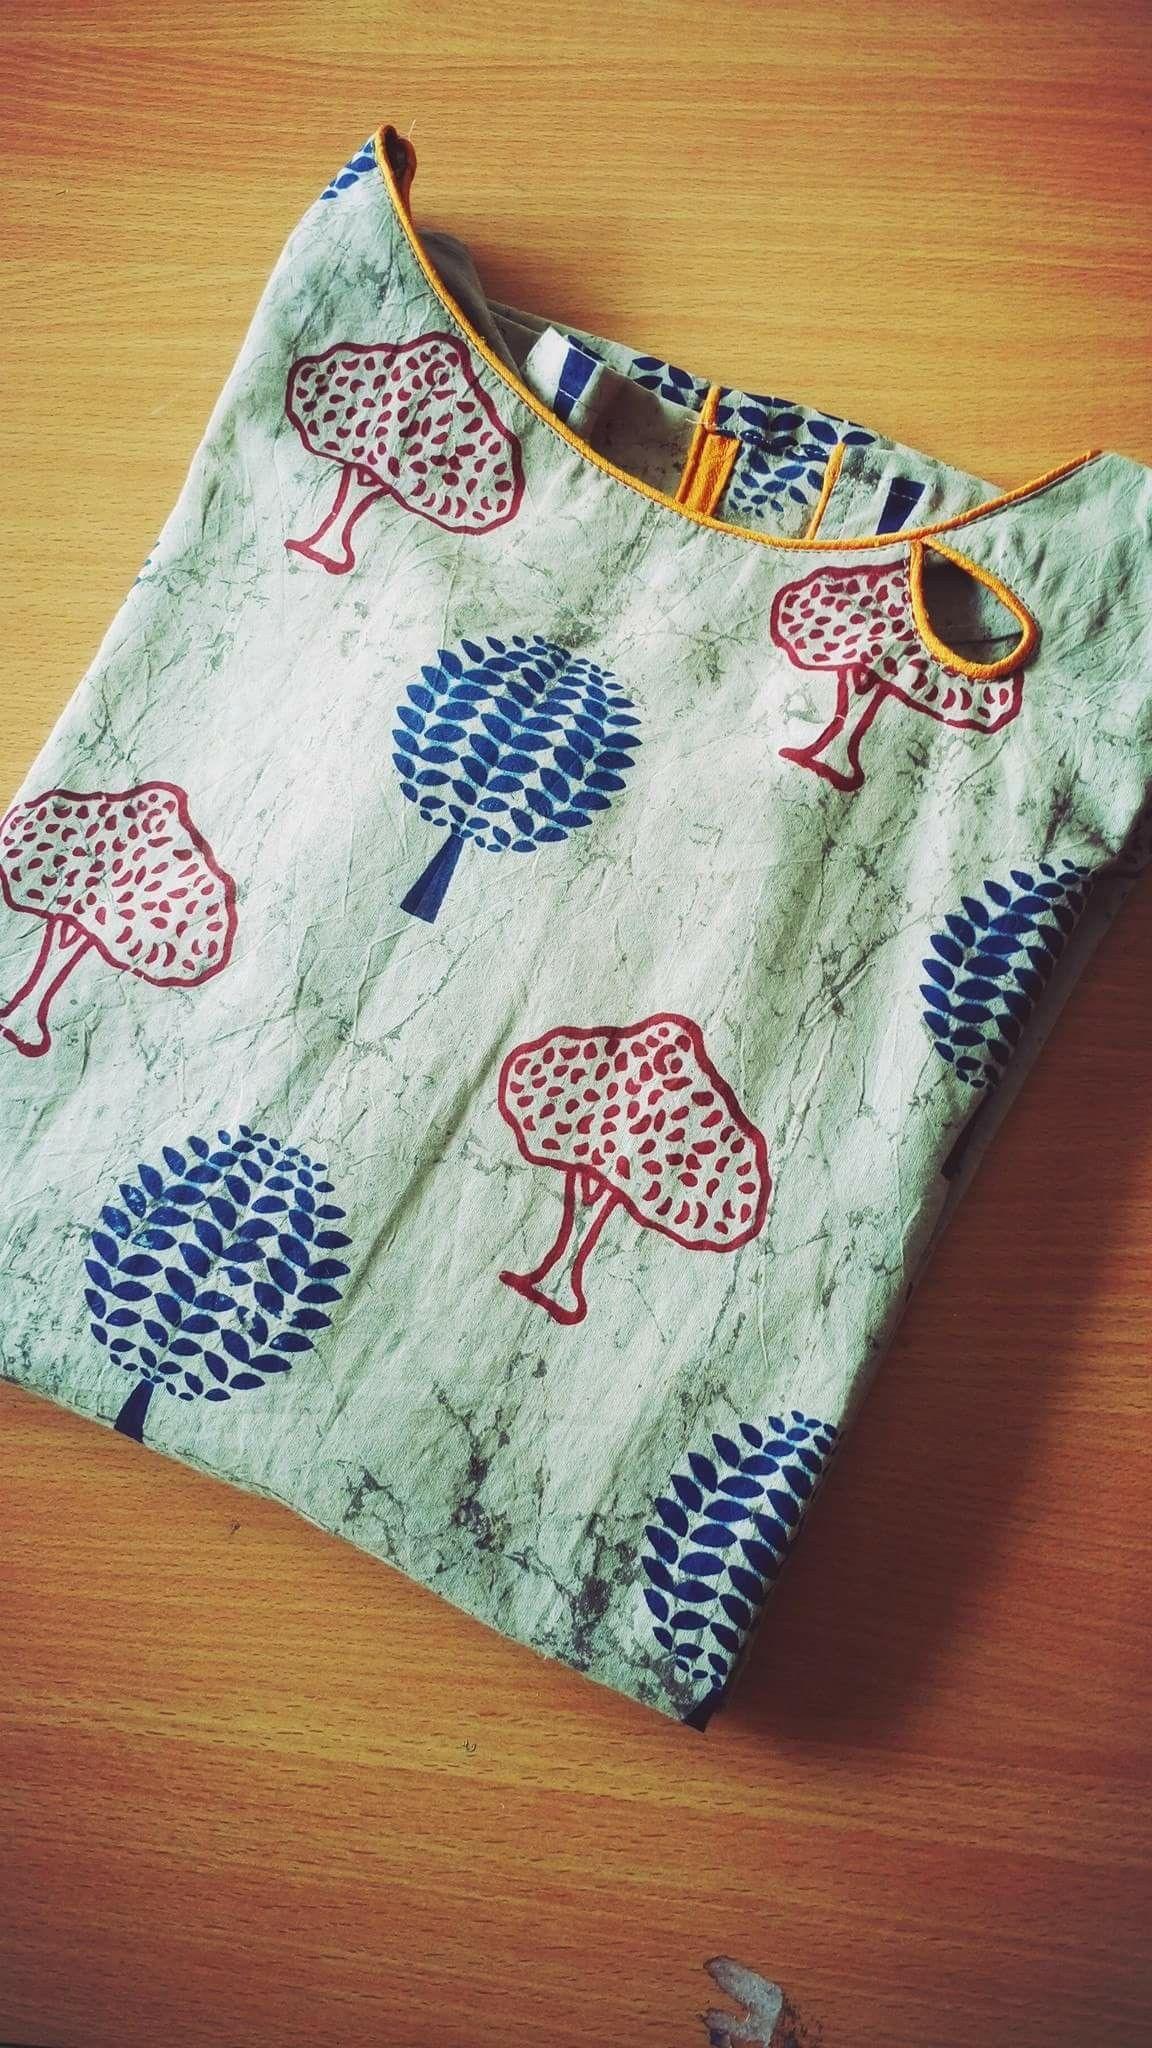 Pin by parimala vallabhaneni on clothing pinterest blouse